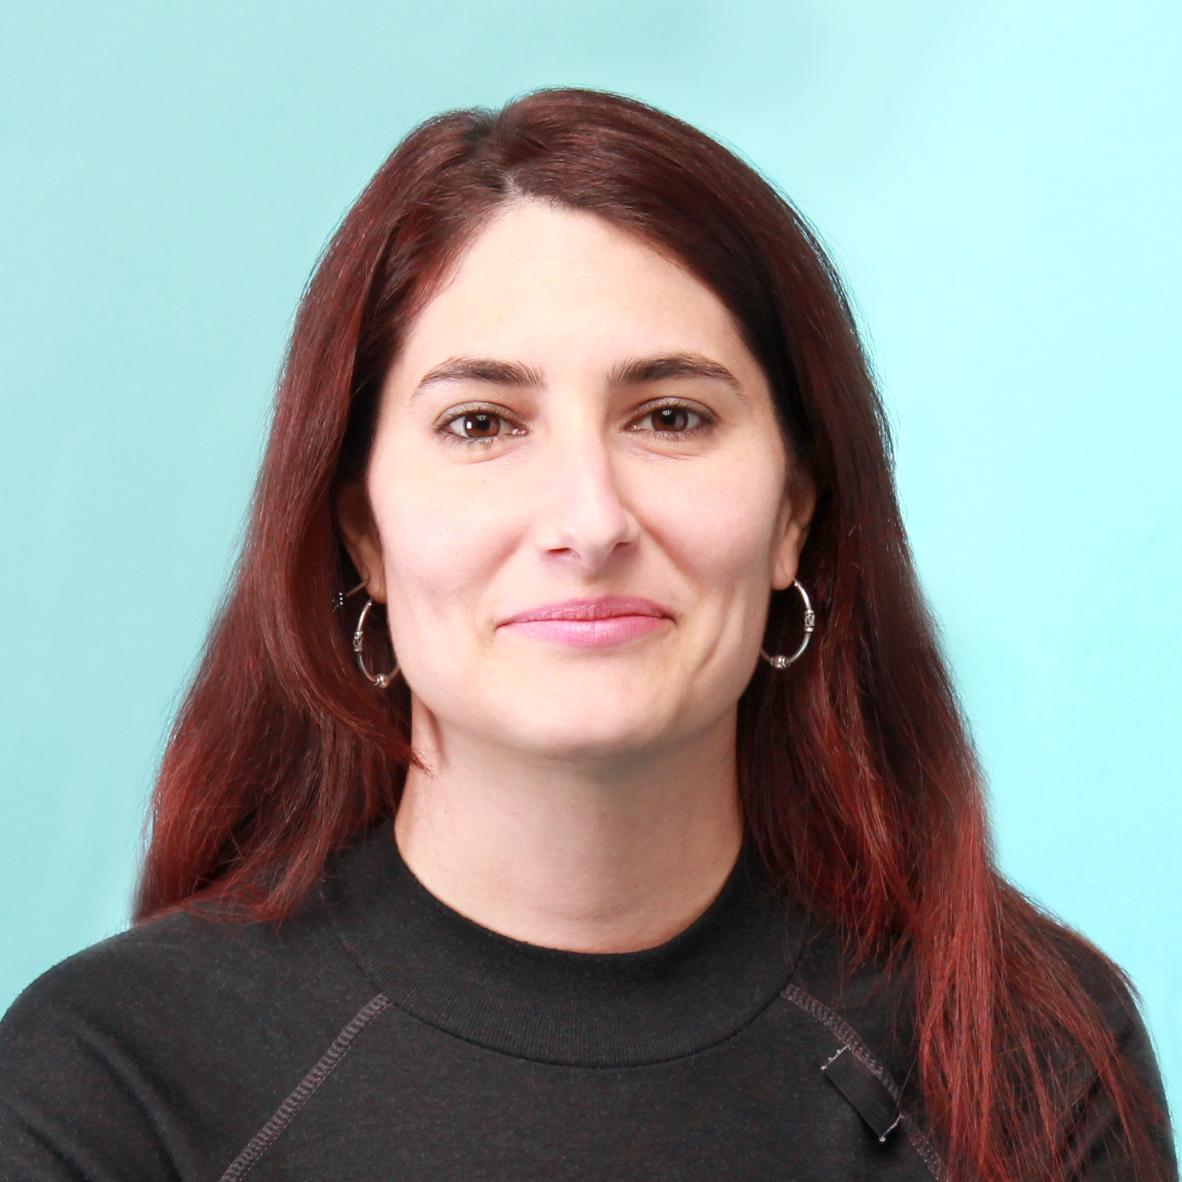 Ana Carmen Ramos